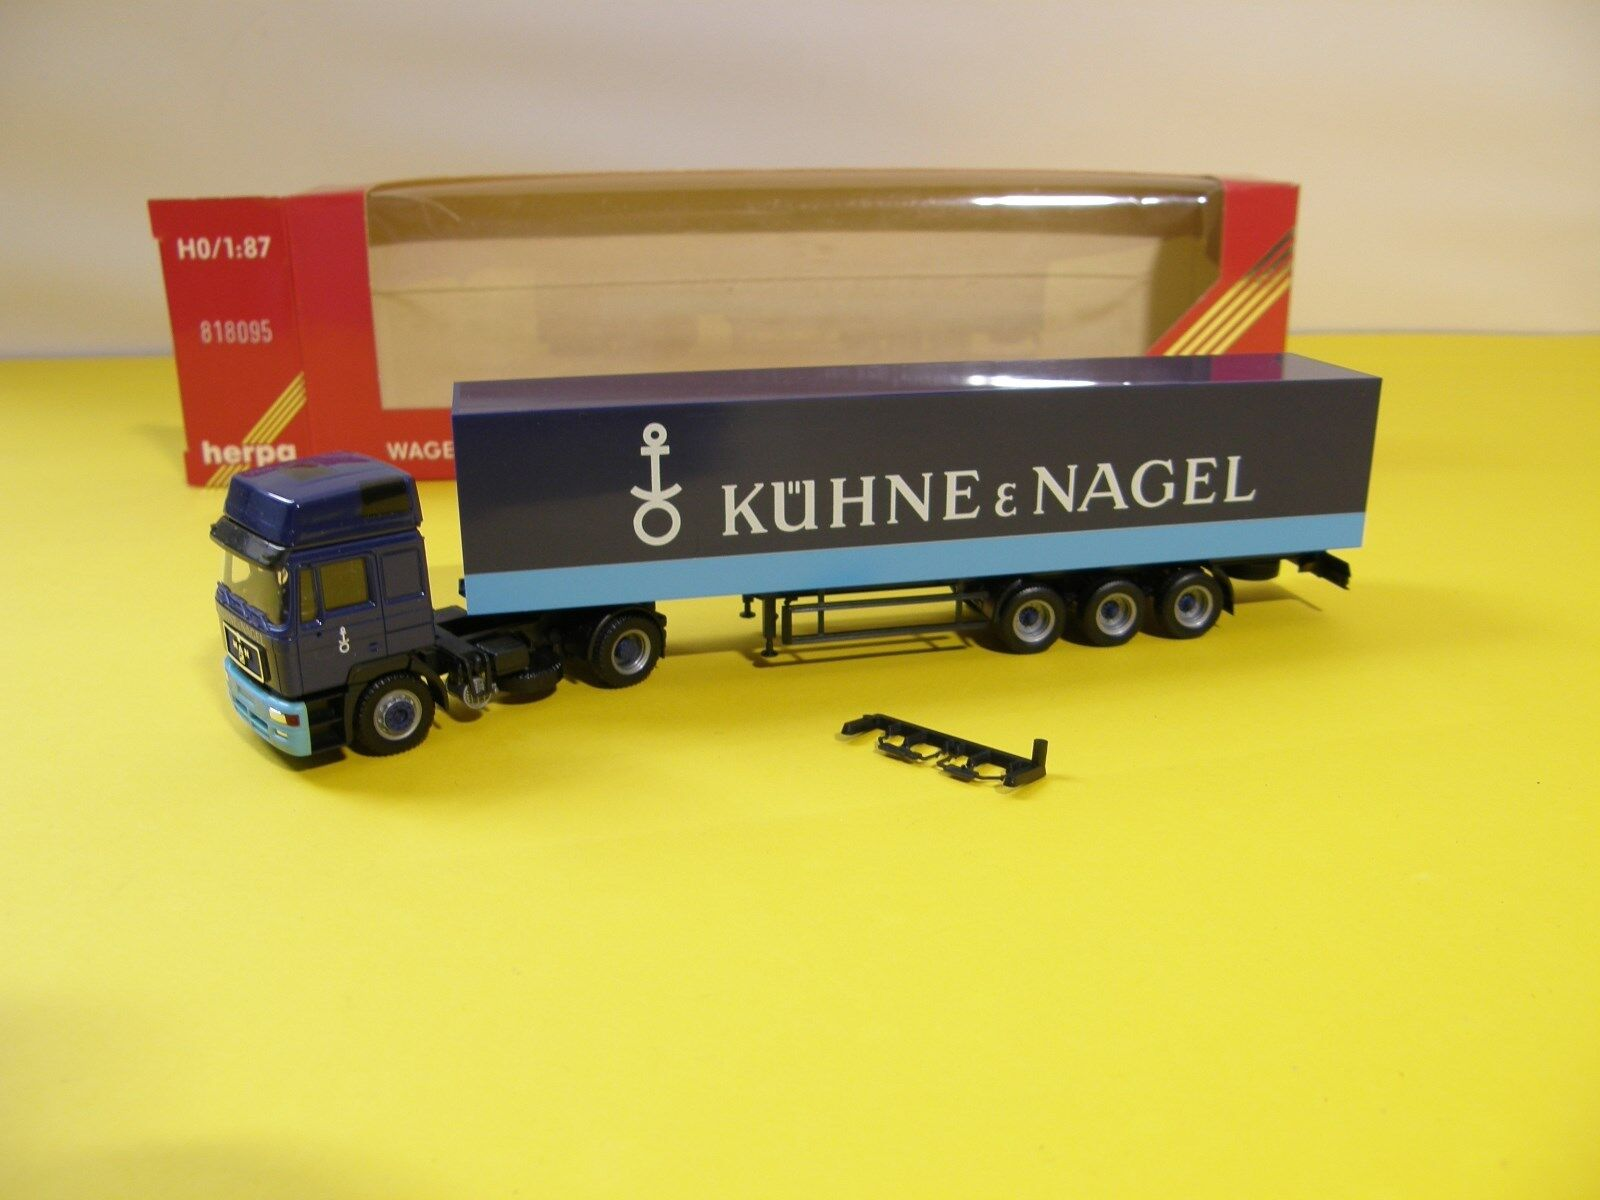 Kühne + Nagel - Kuehne + Nagel MAN SZ herpa Bielefeld Bremen herpa